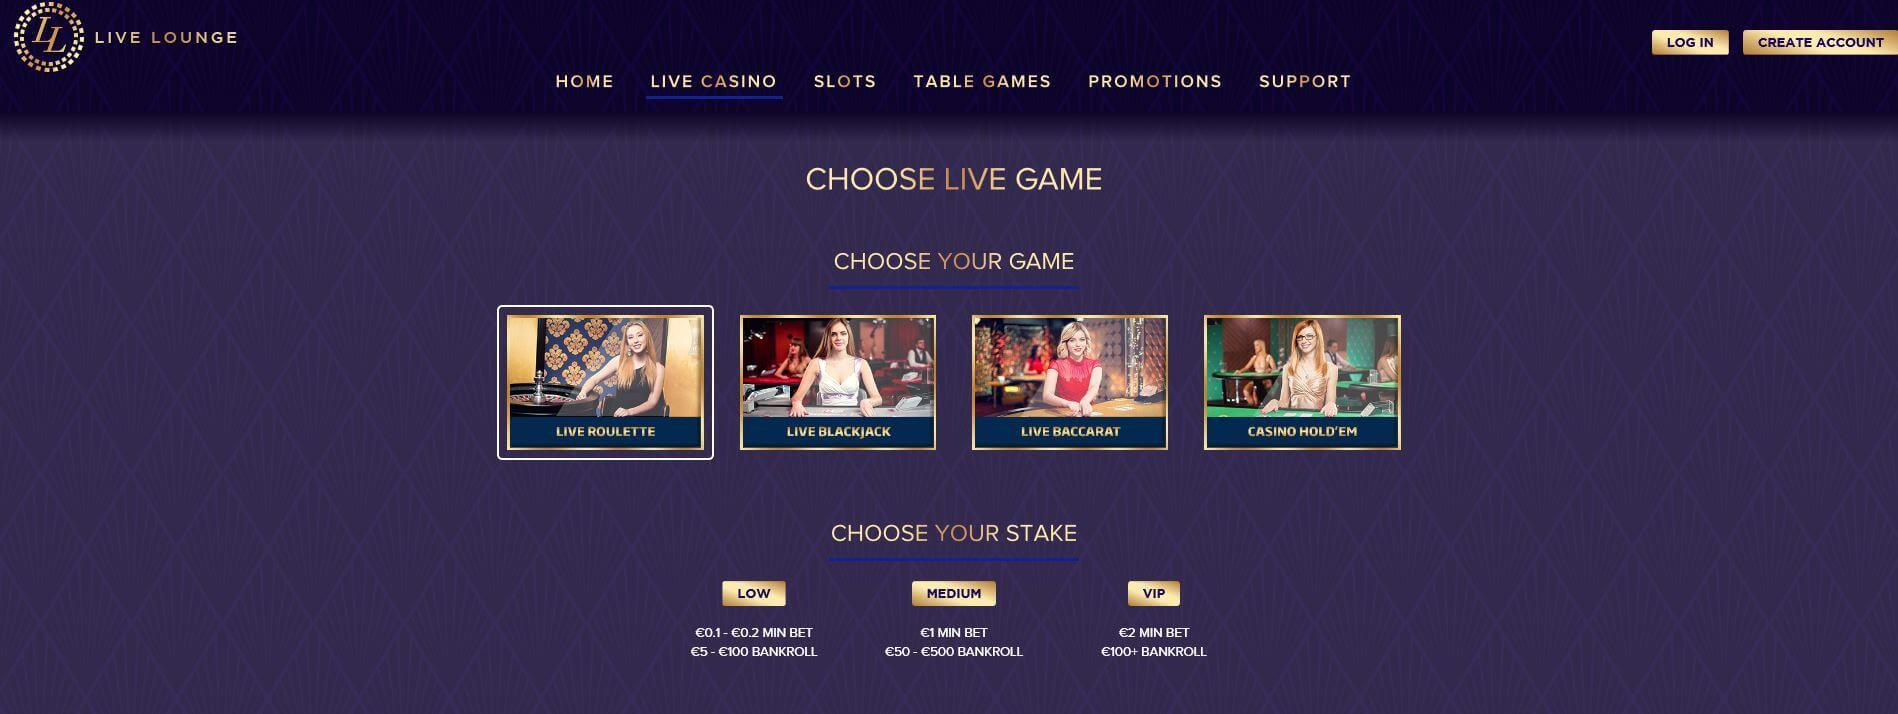 Live-Lounge-Live-Casino